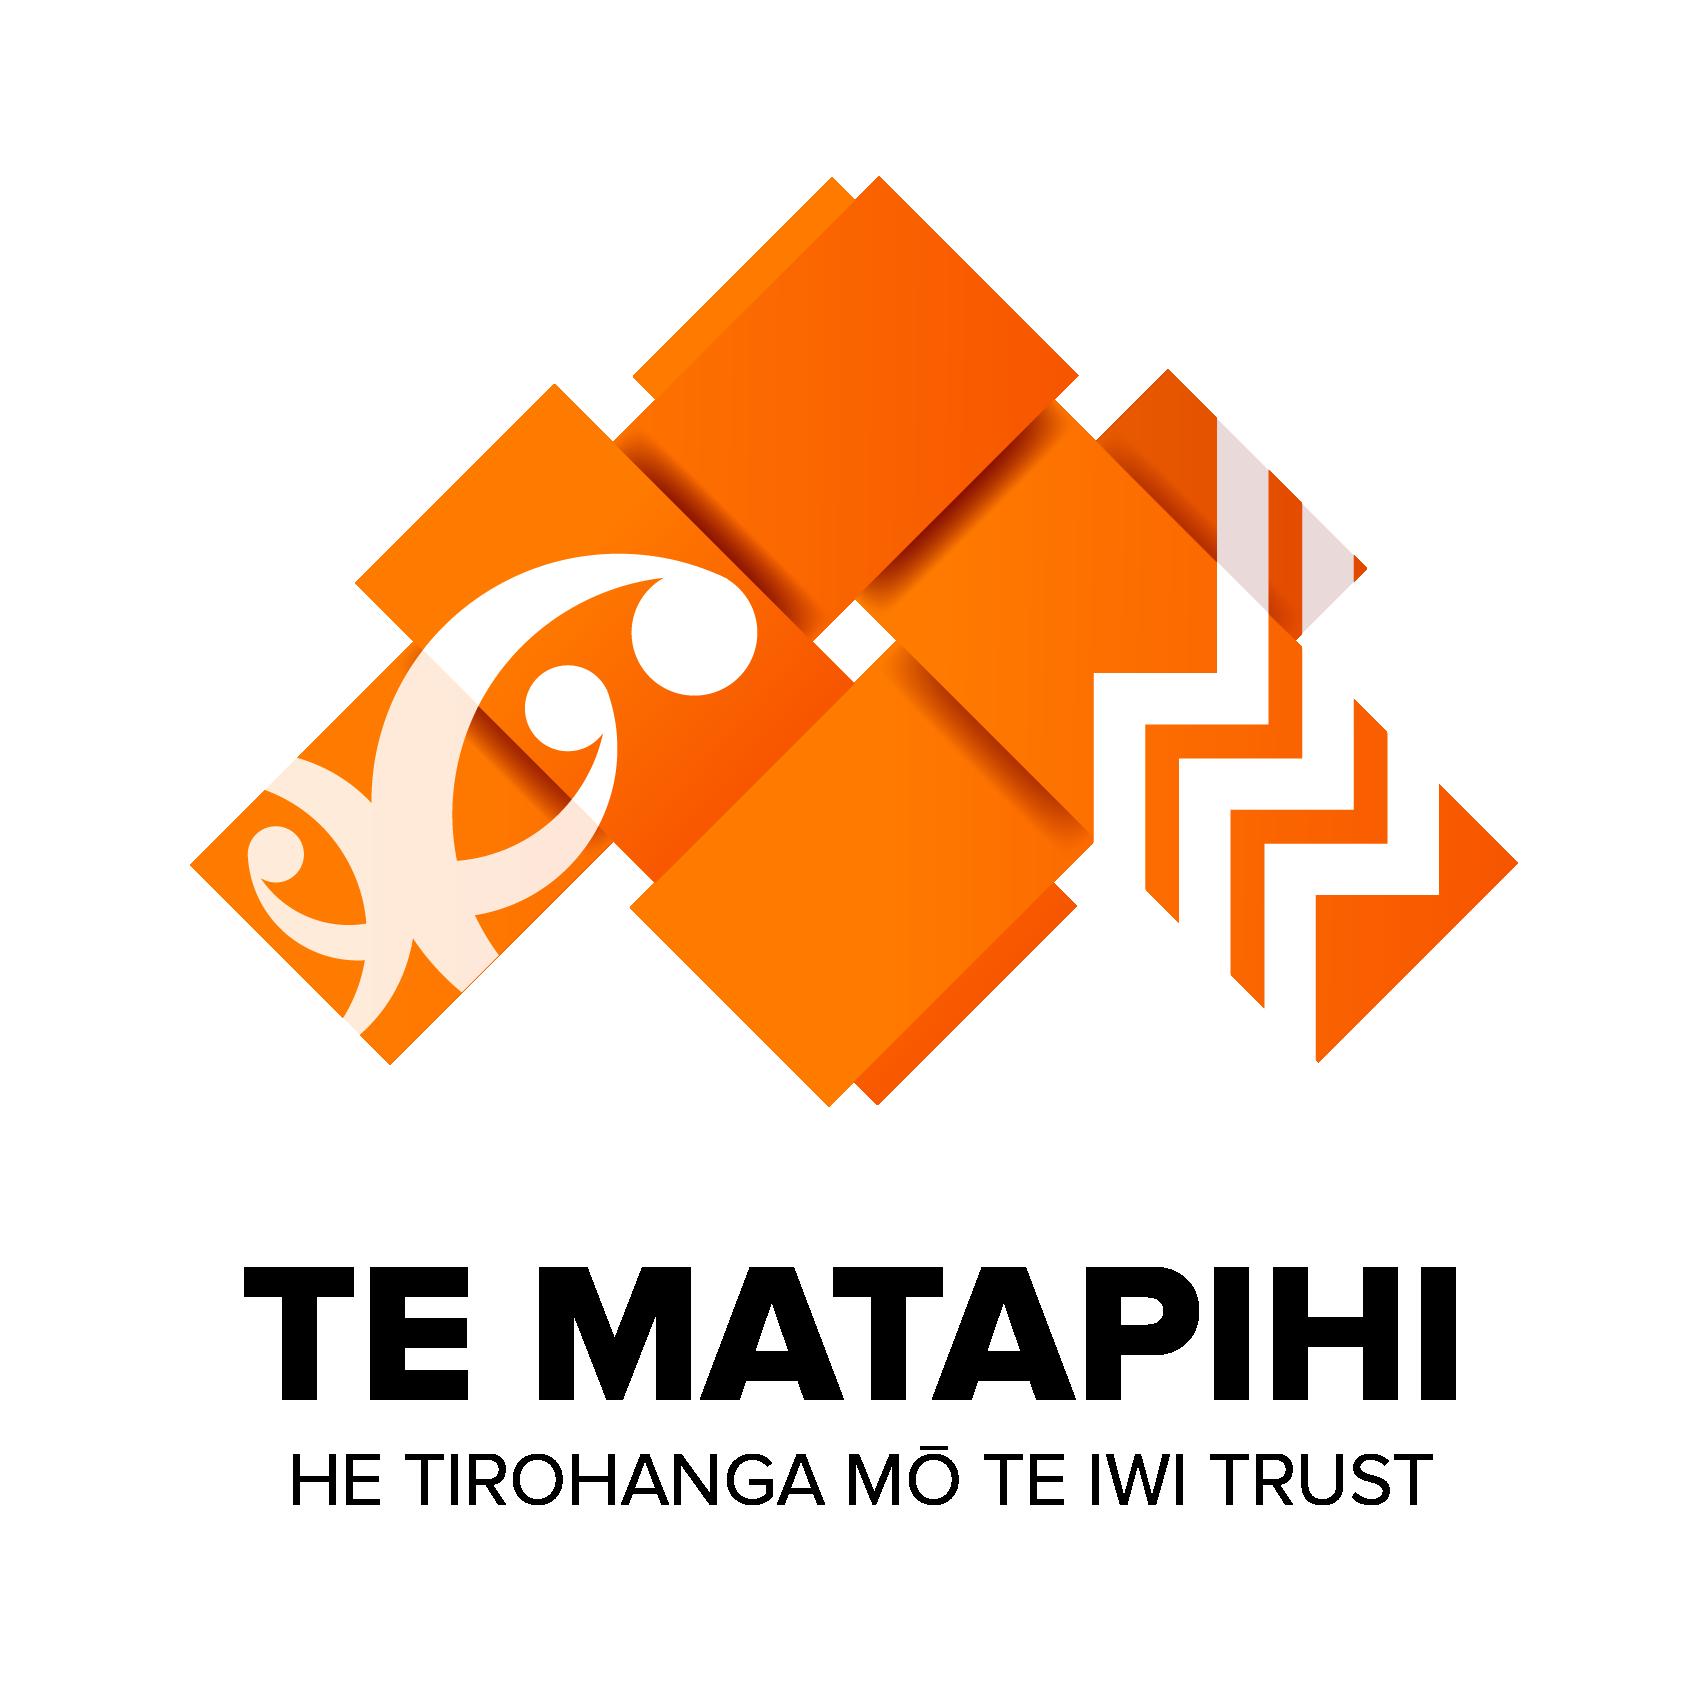 Te matapihi logo rgb orange 01